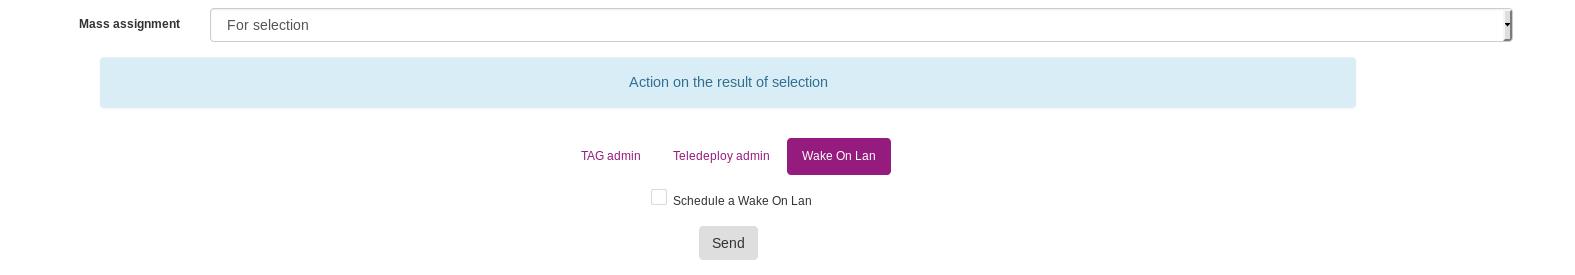 Using Wake On Lan - OCS Inventory Documentation